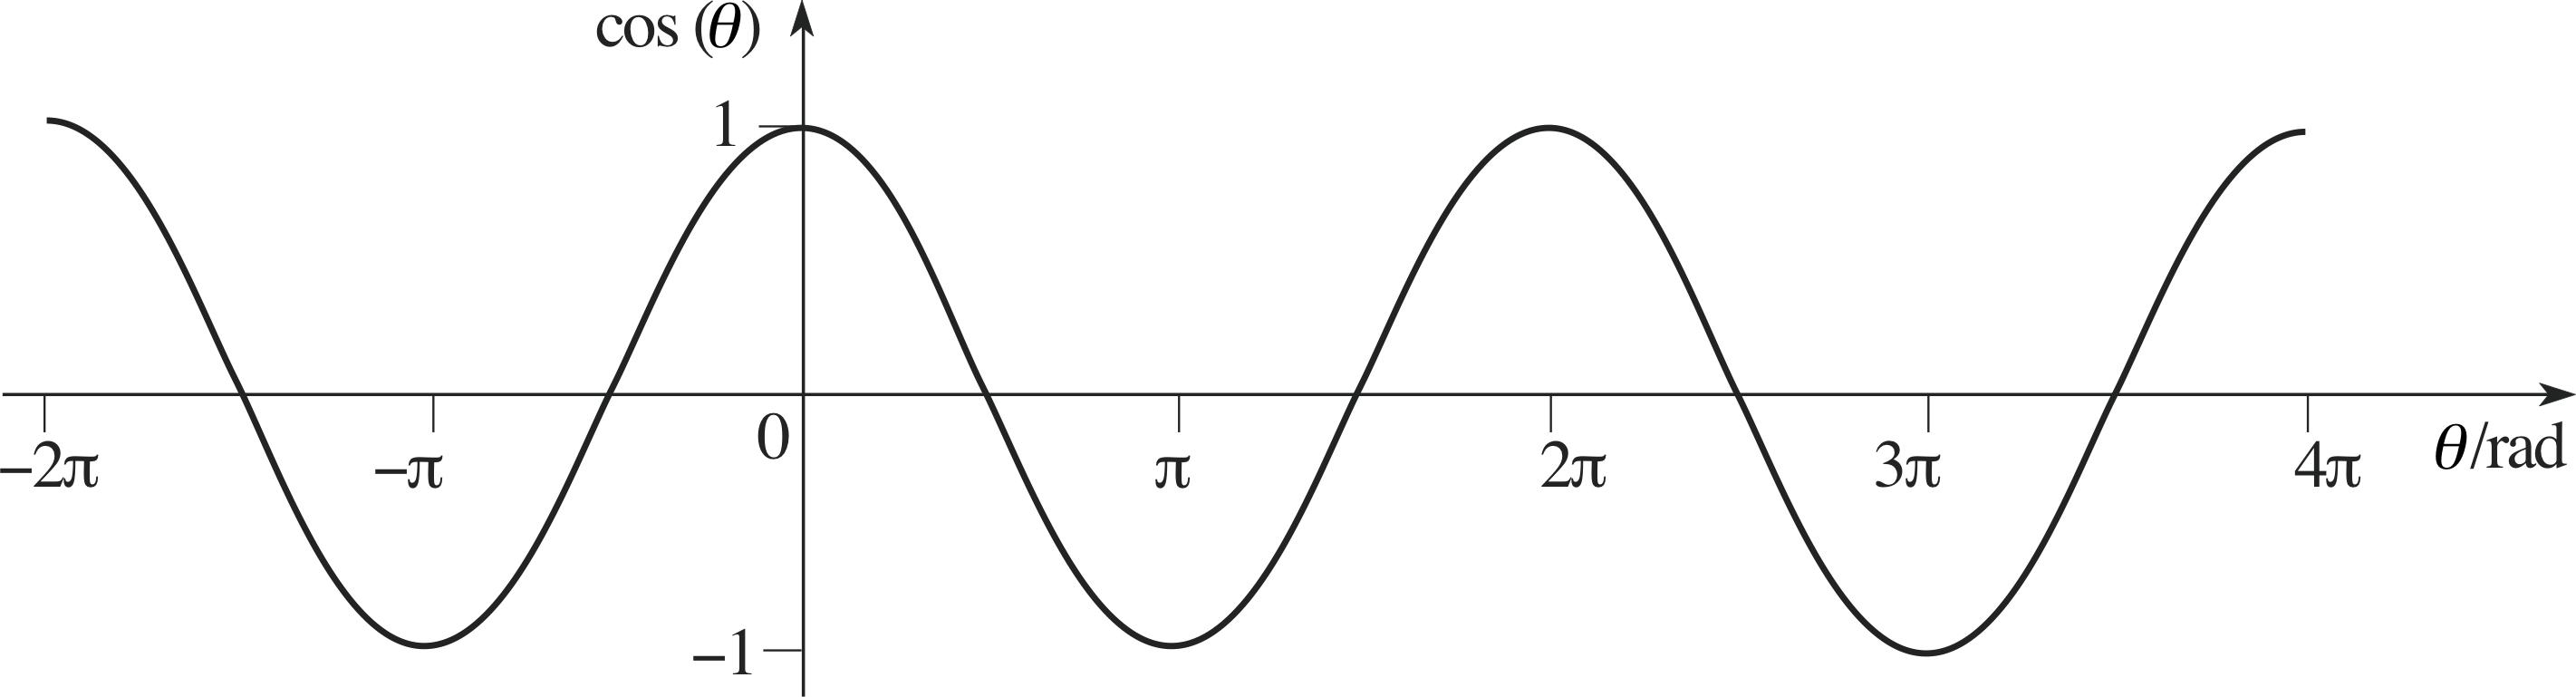 Geometry clipart trigonometric function. Pplato flap math functions